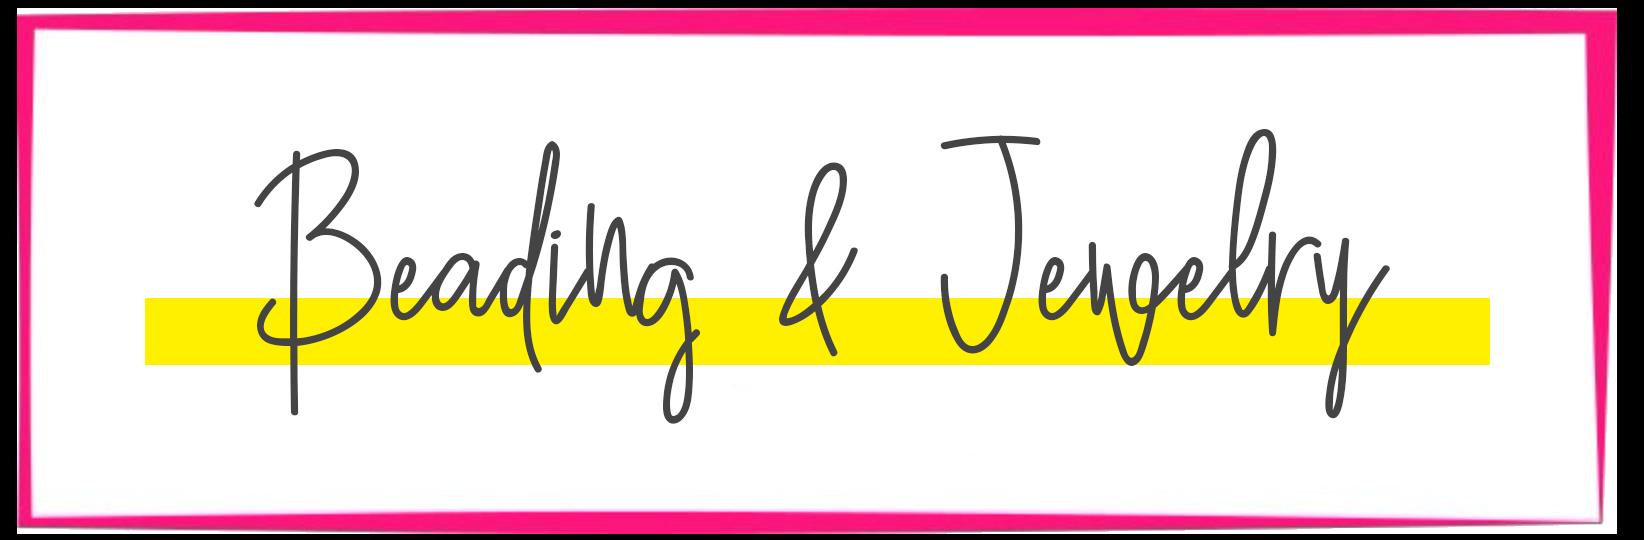 Beading & Jewelry Title Graphic